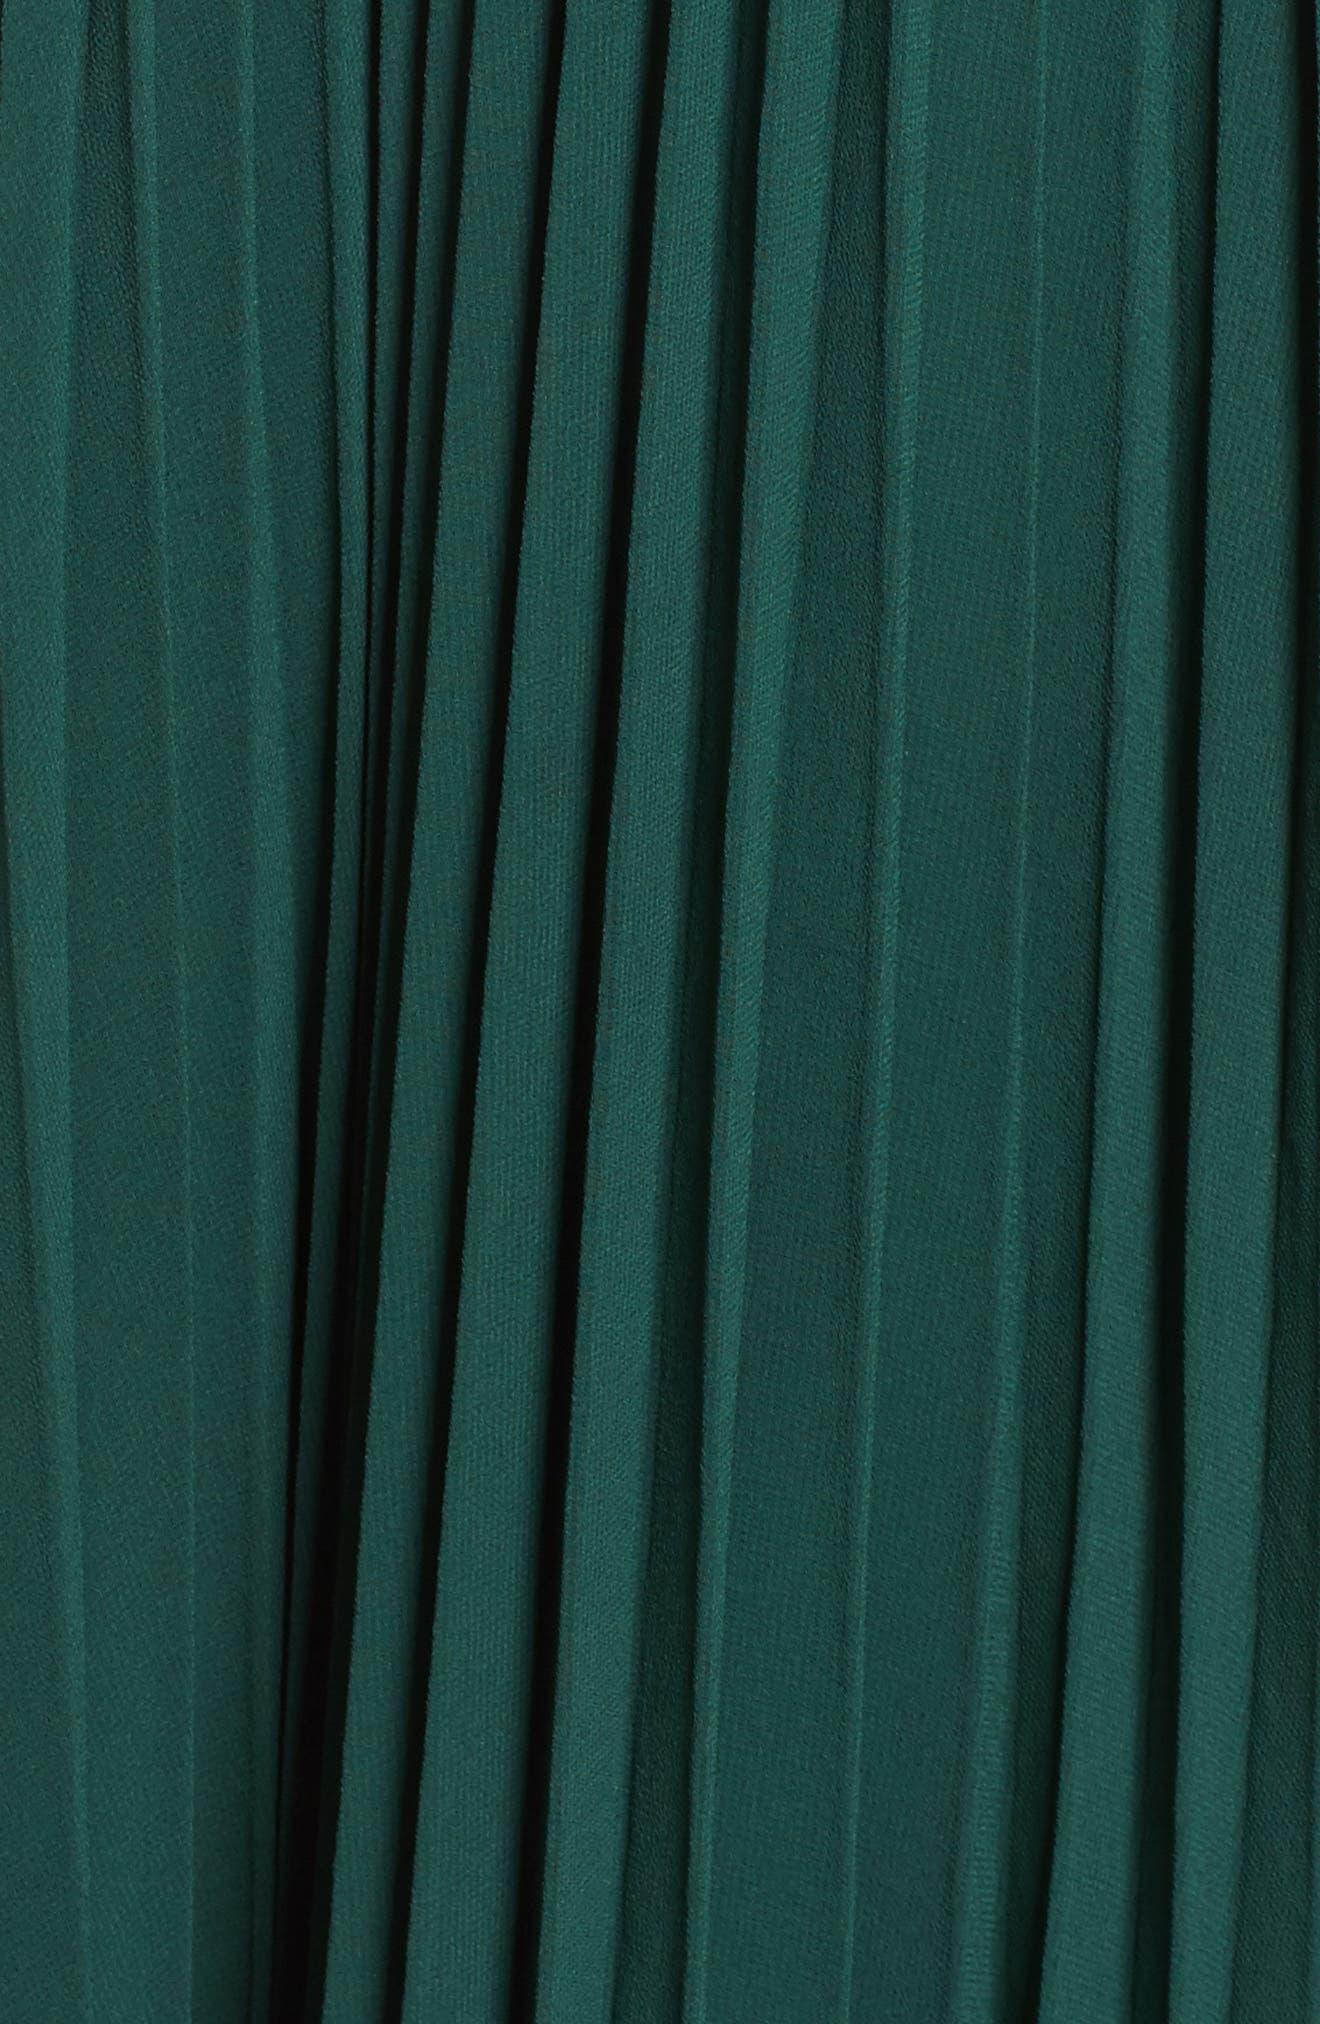 Fame & Partners Allegra Pleat Gown,                             Alternate thumbnail 5, color,                             Dark Forest